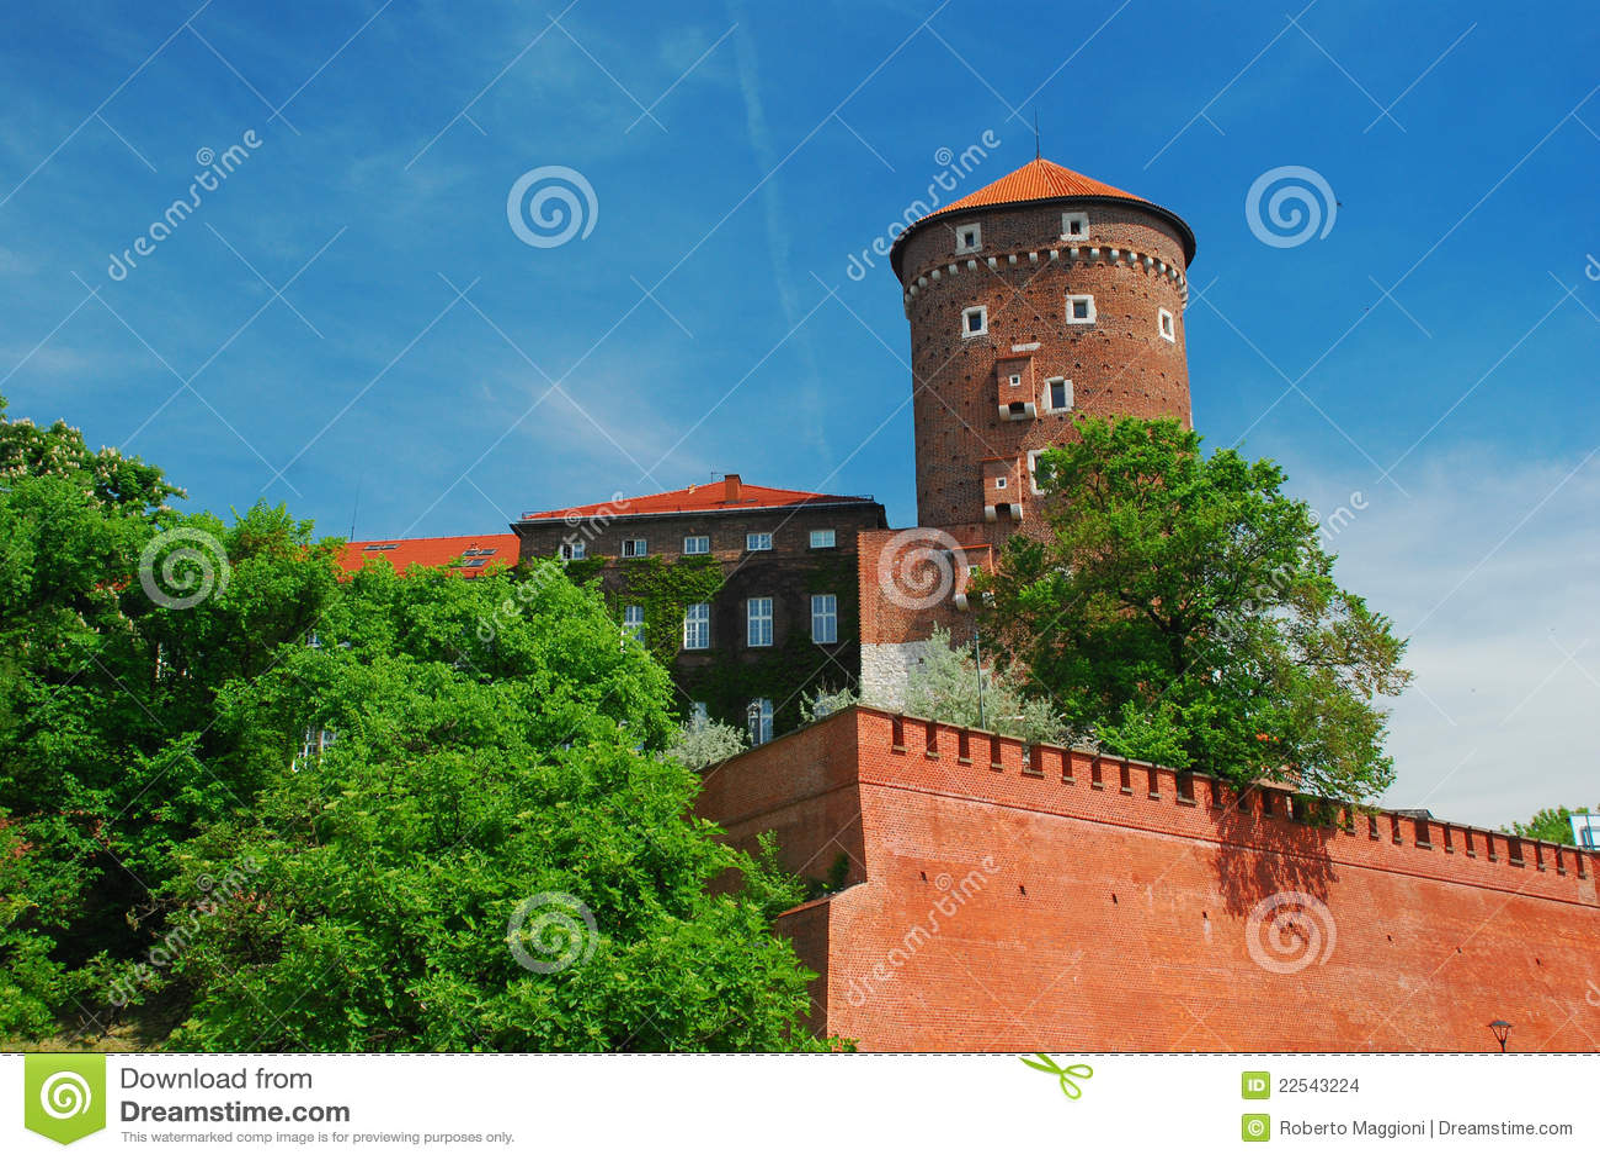 Krakow, Poland. Castelo de Wawel